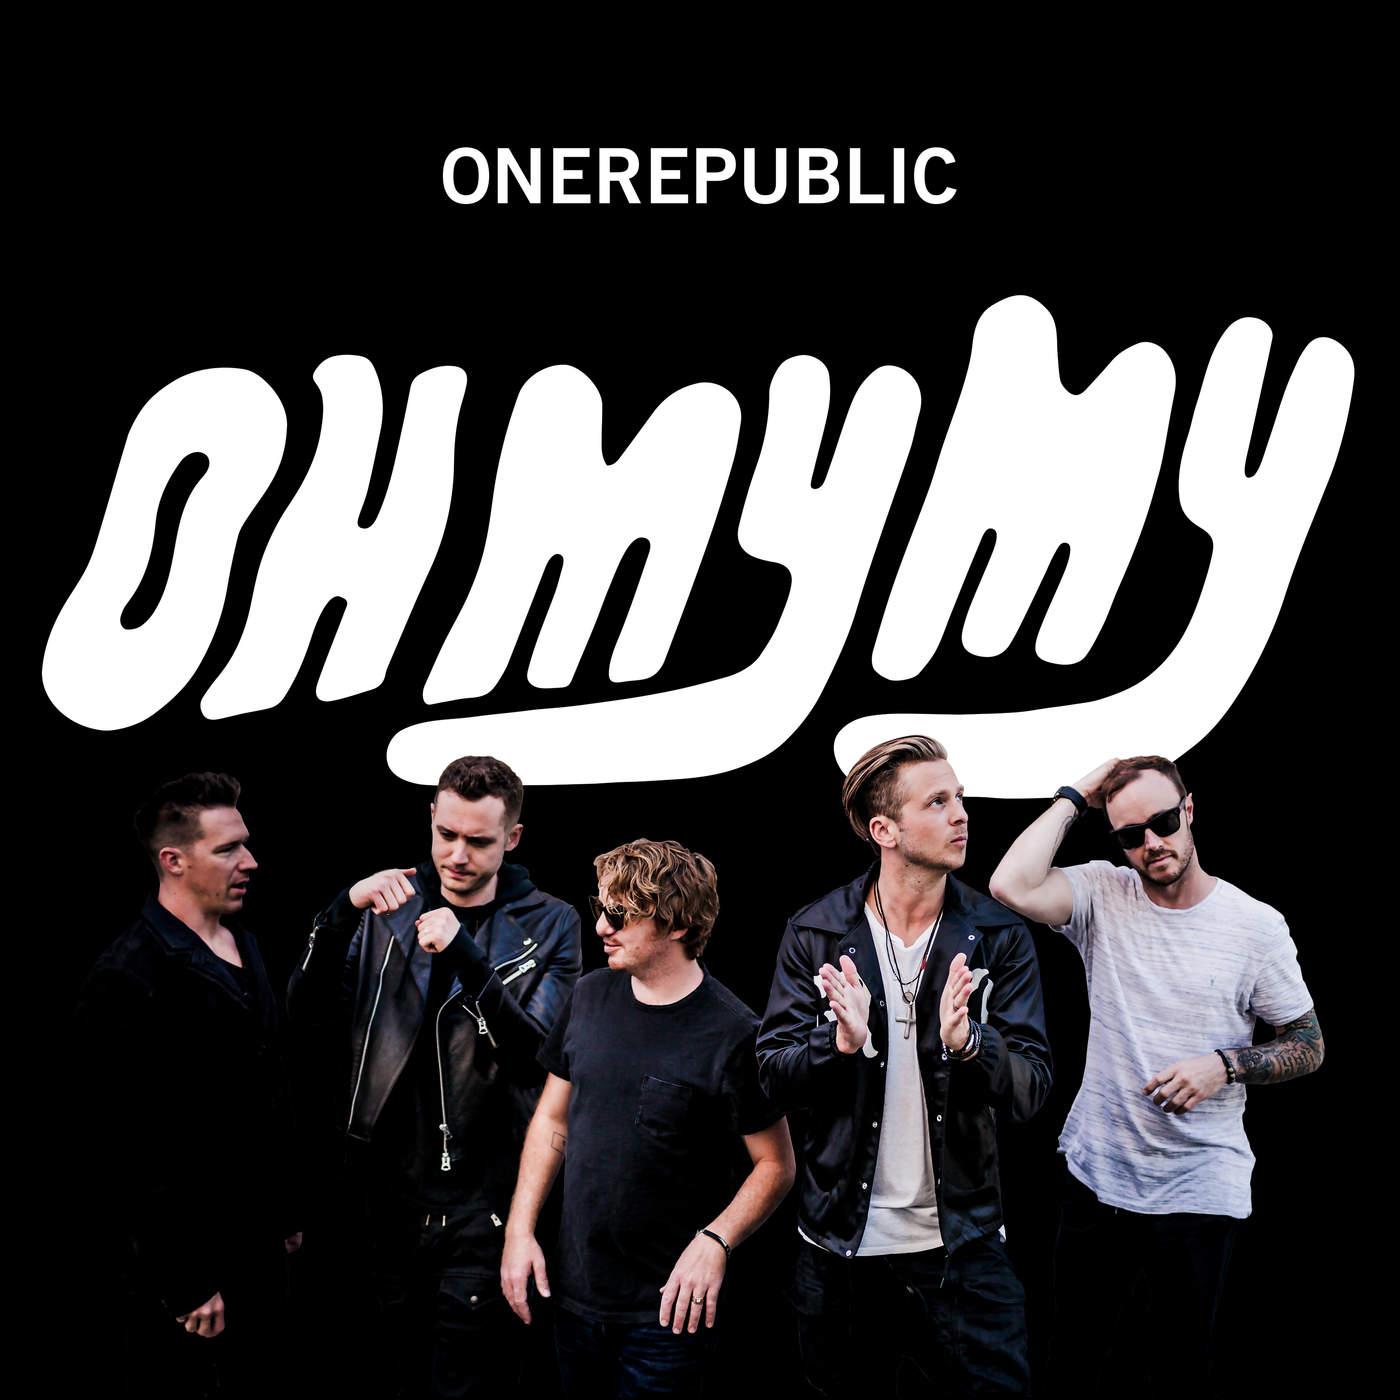 OneRepublic - Oh My My (Deluxe) Cover